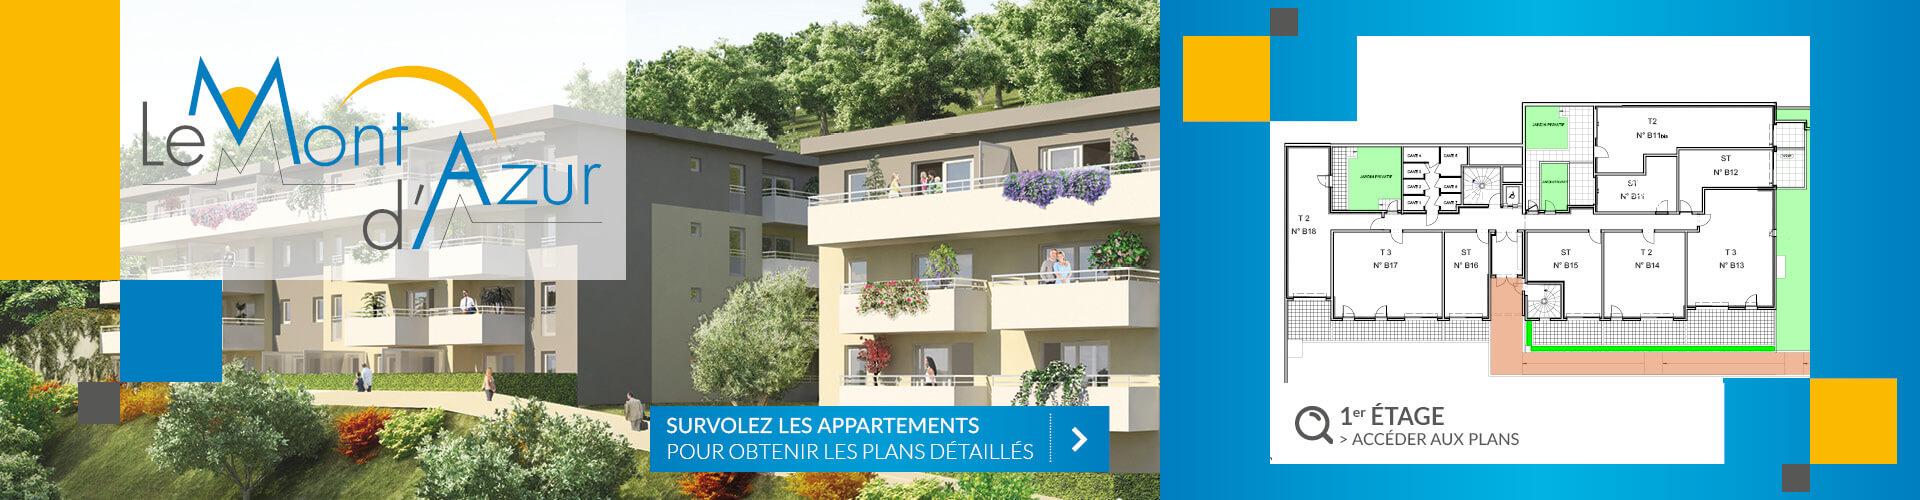 Résidence Mont d'Azur 1er étage Segeprim